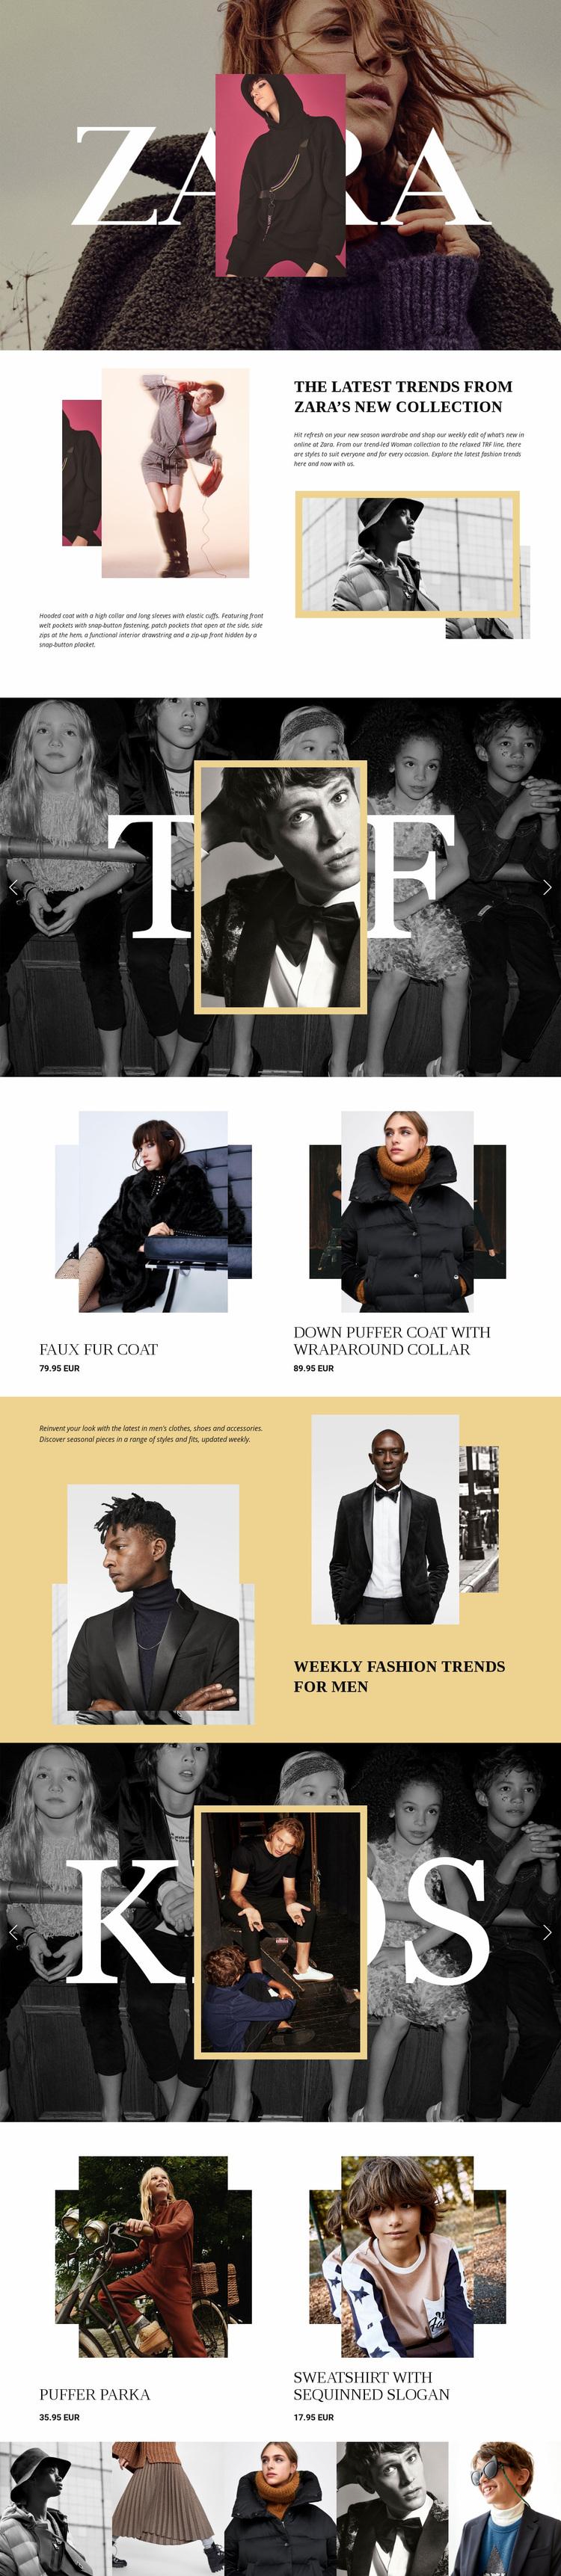 Zara Web Page Designer